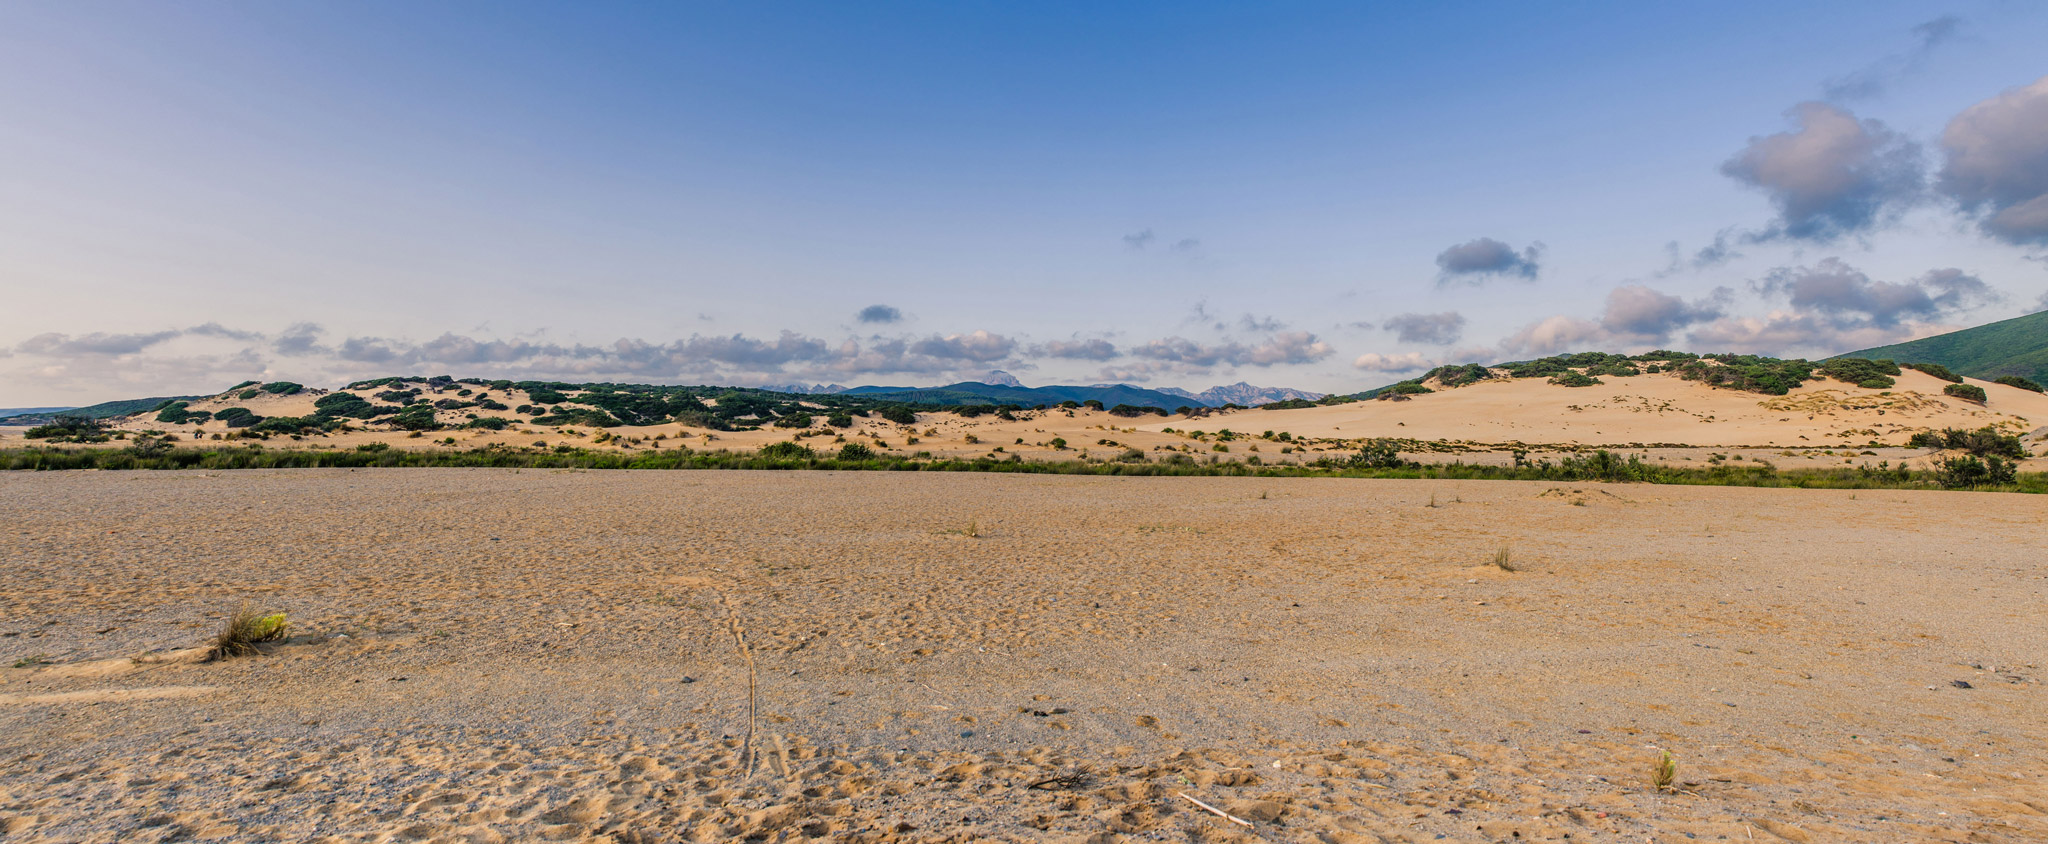 Paesaggi-Italia - DSC 9075  - Dune-sabbia-spiaggia-di-Piscinas-Sardegna - Dune-sabbia-spiaggia-di-Piscinas-Sardegna